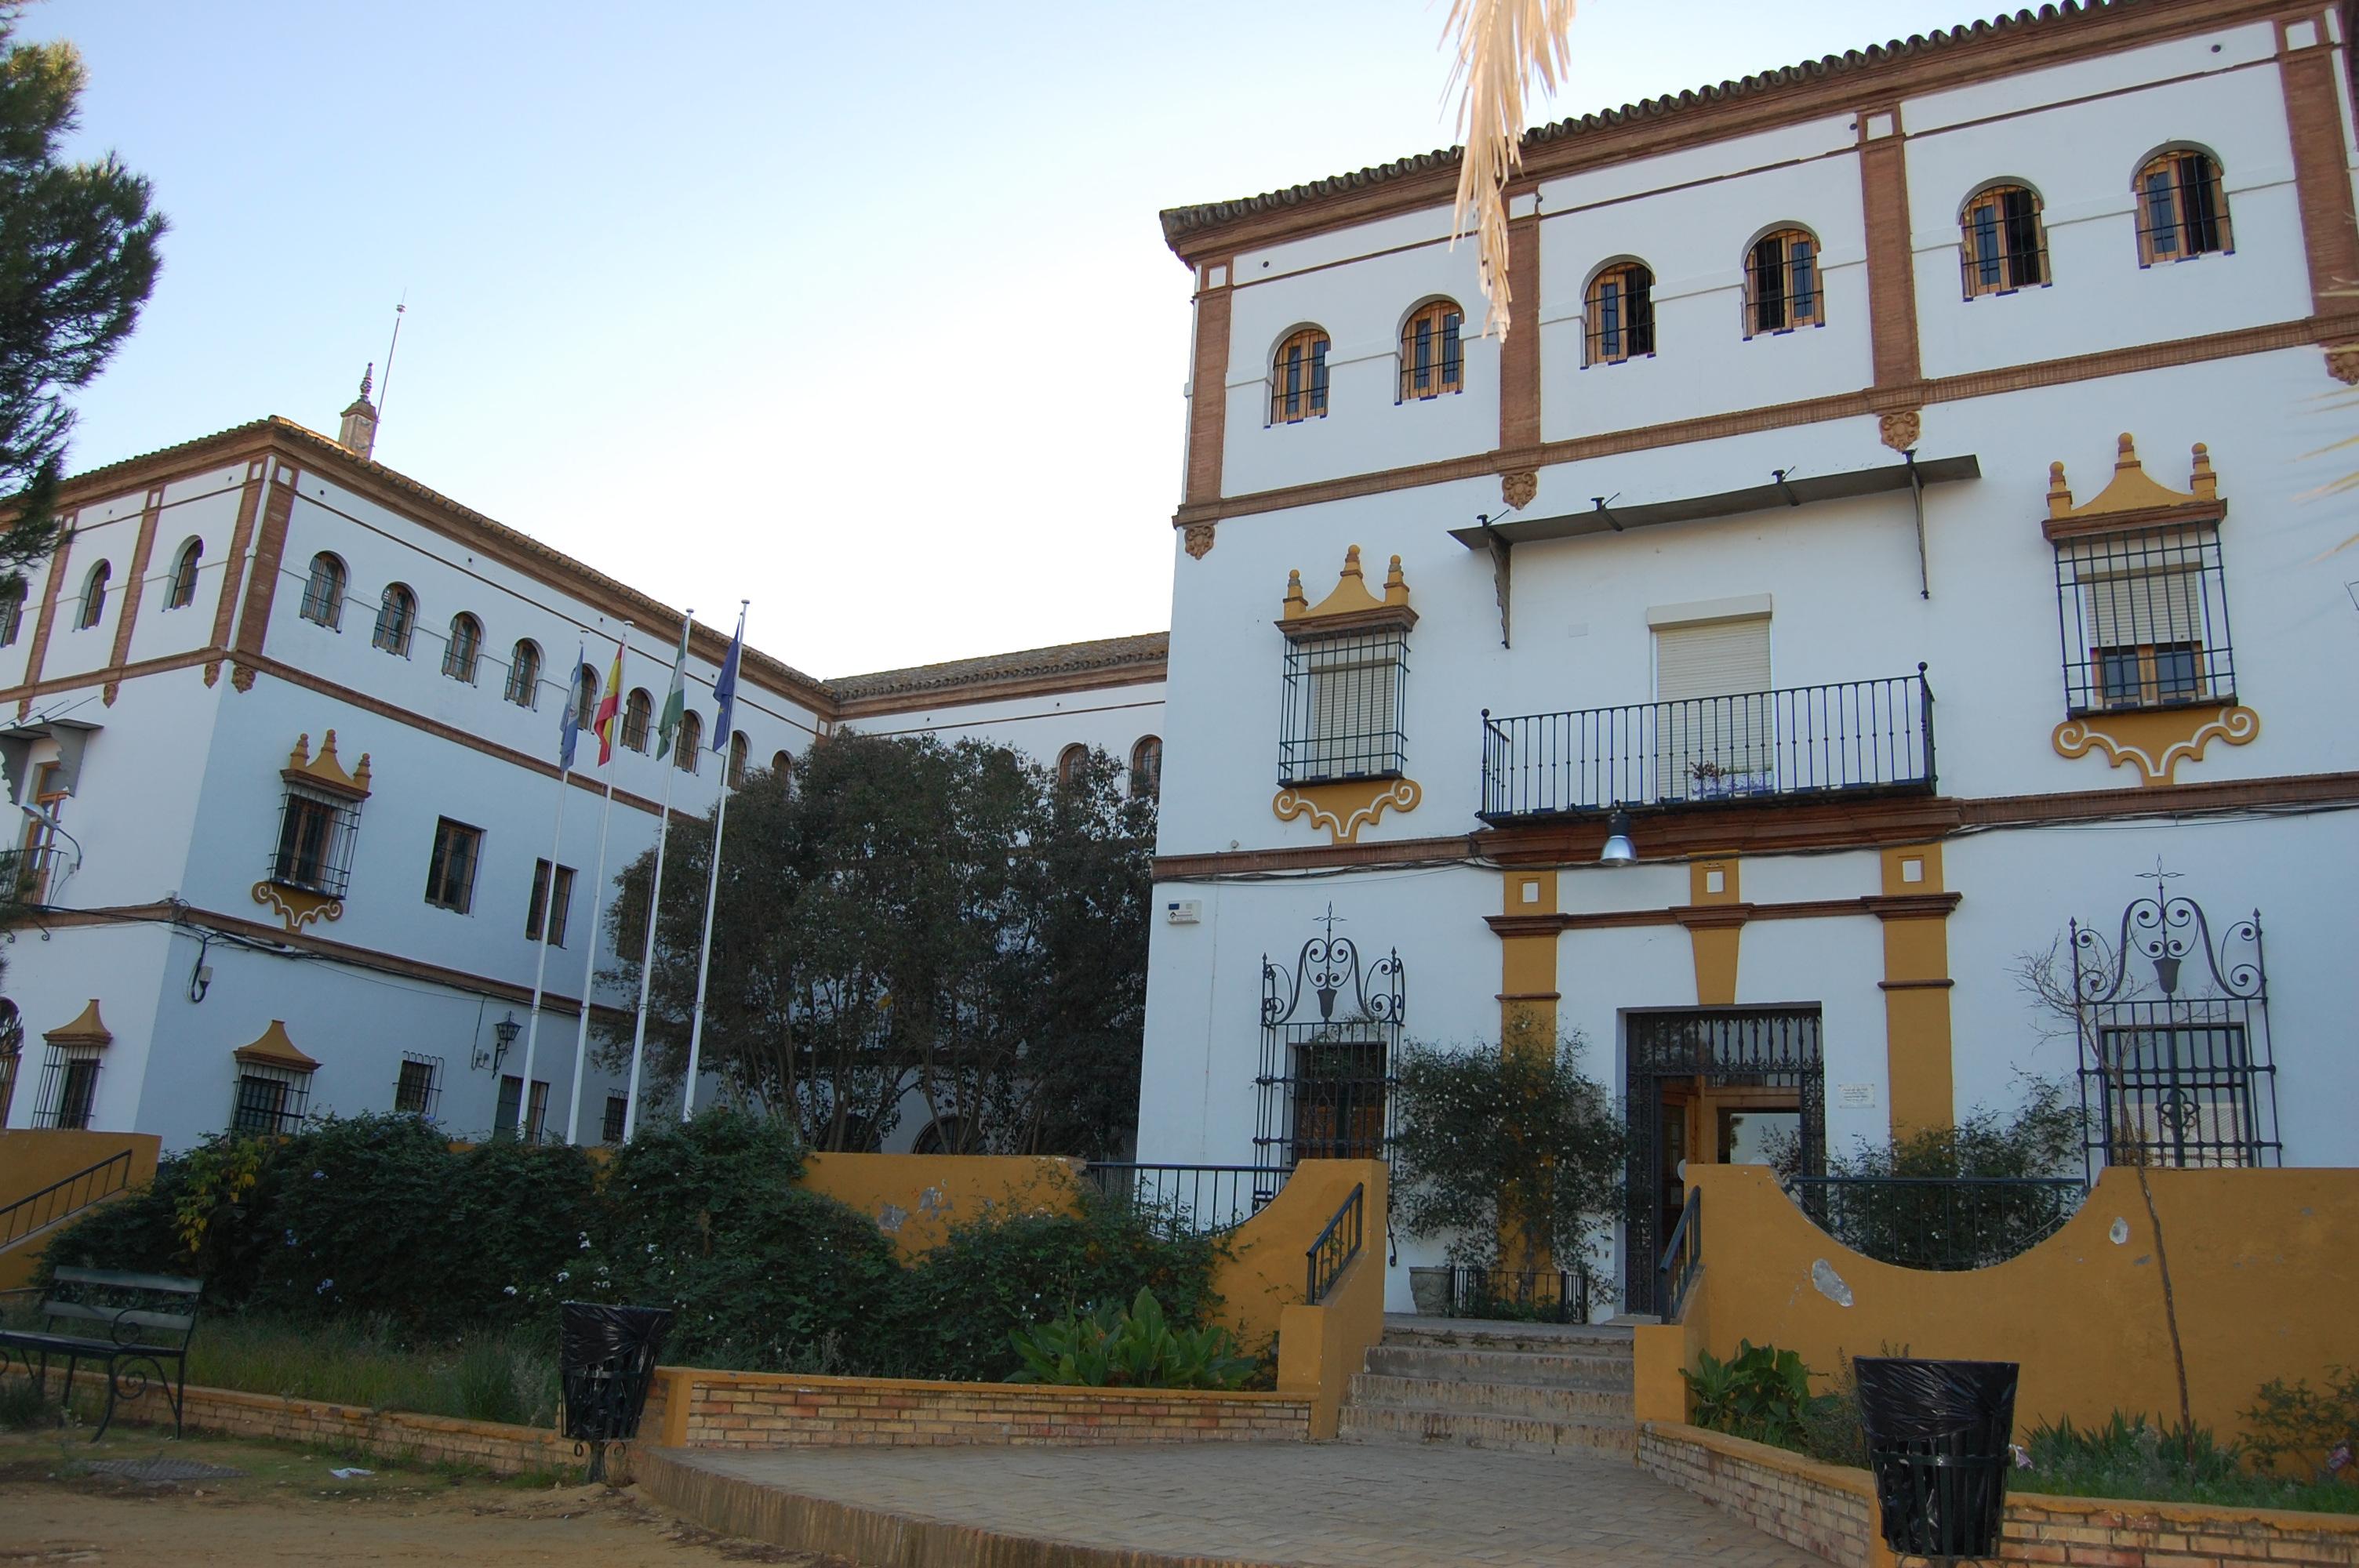 Datos del Centro del Profesorado de Alcalá de Guadaira